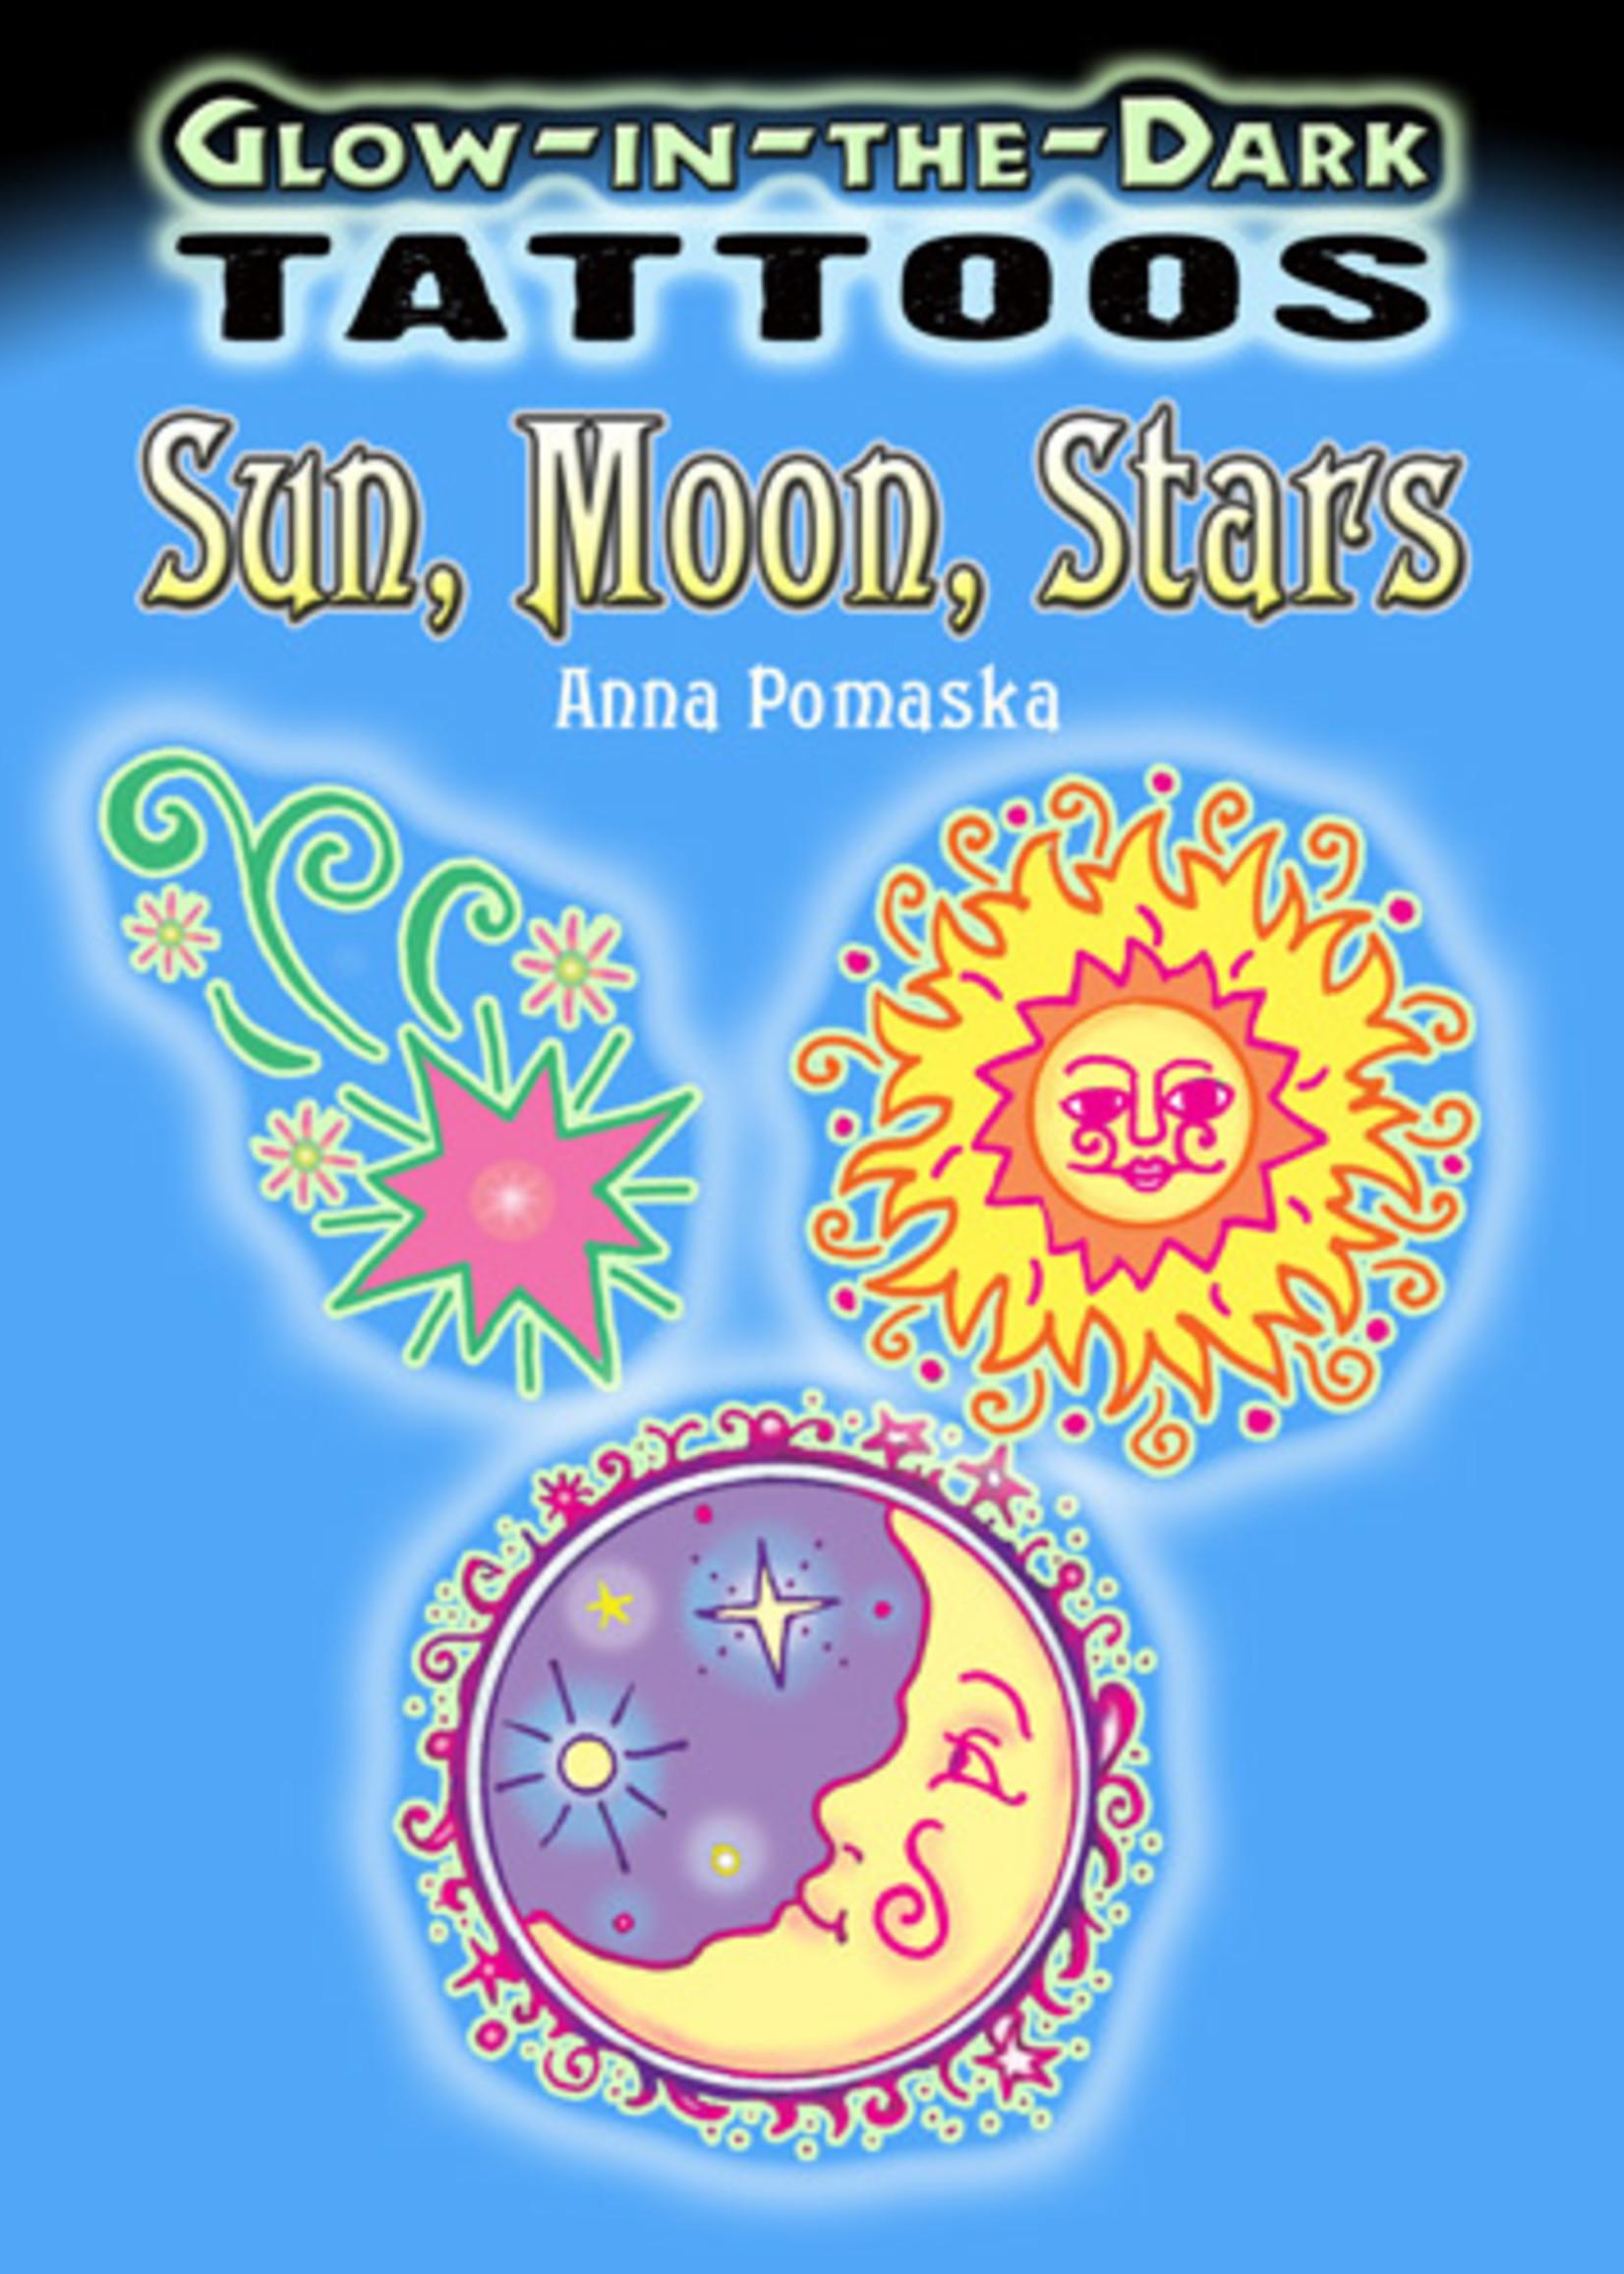 Glow-in-the-Dark Tattoos Sun, Moon, Stars